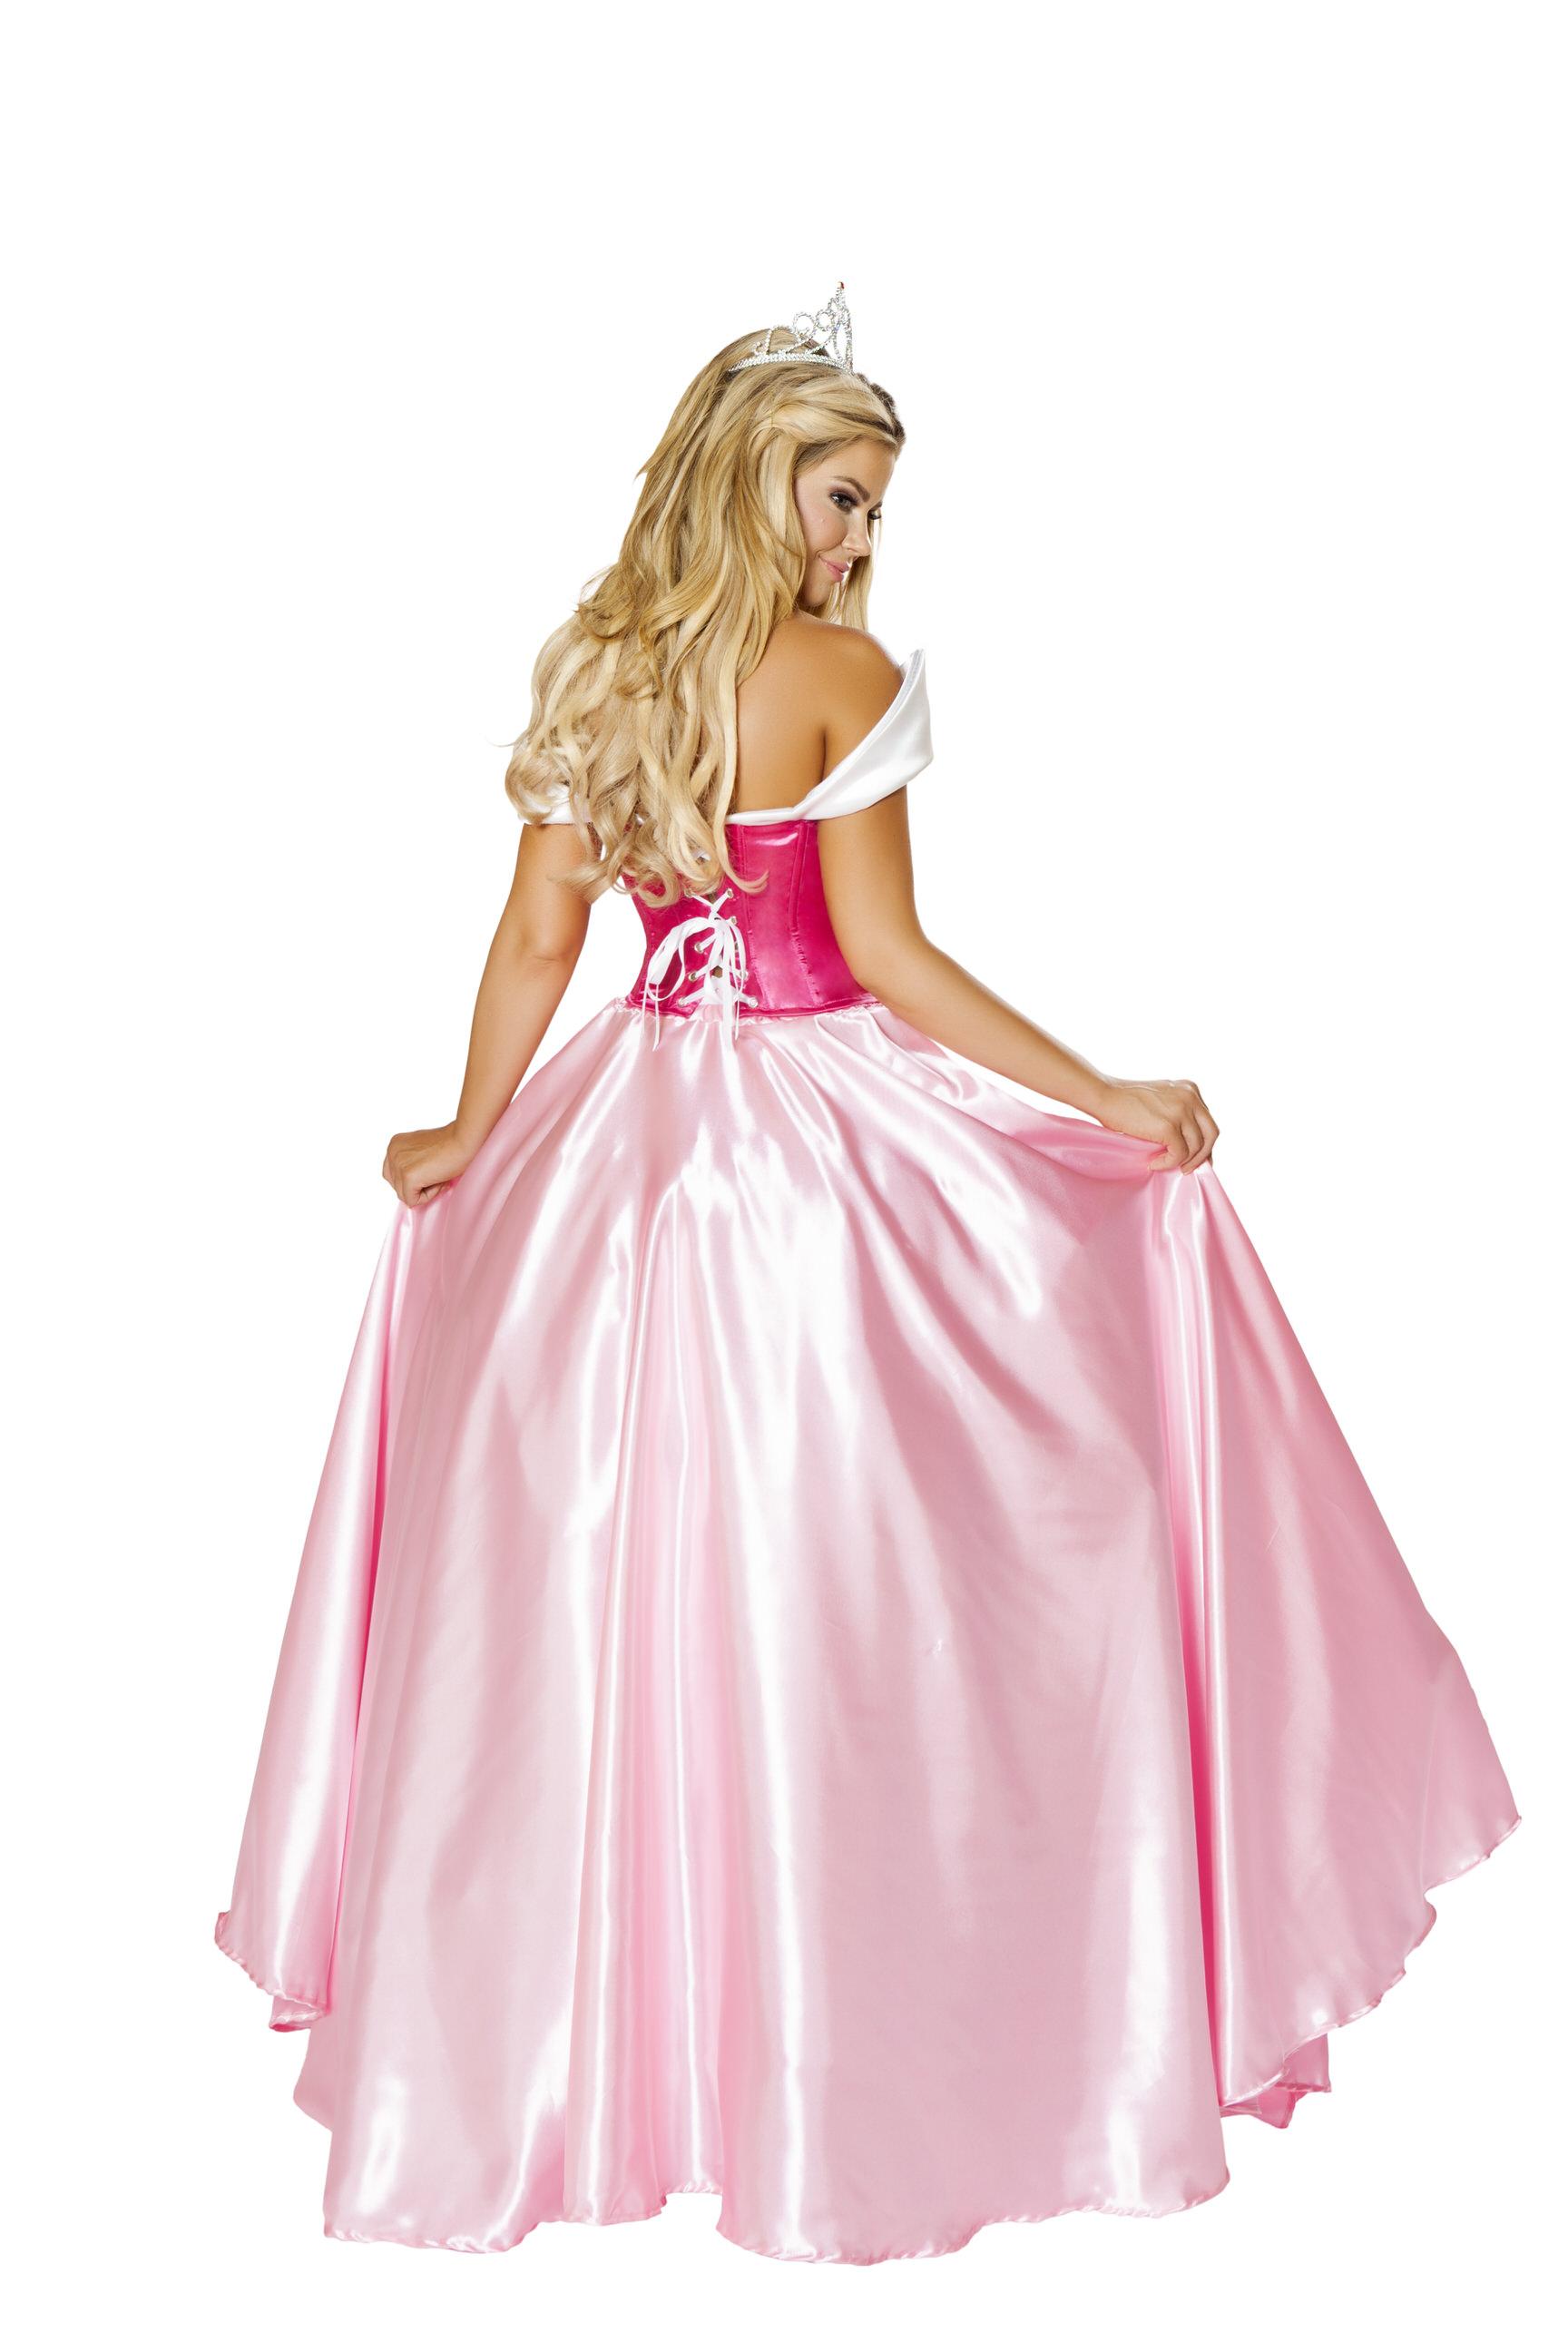 Enchanting Sleeping Princess Gown Back